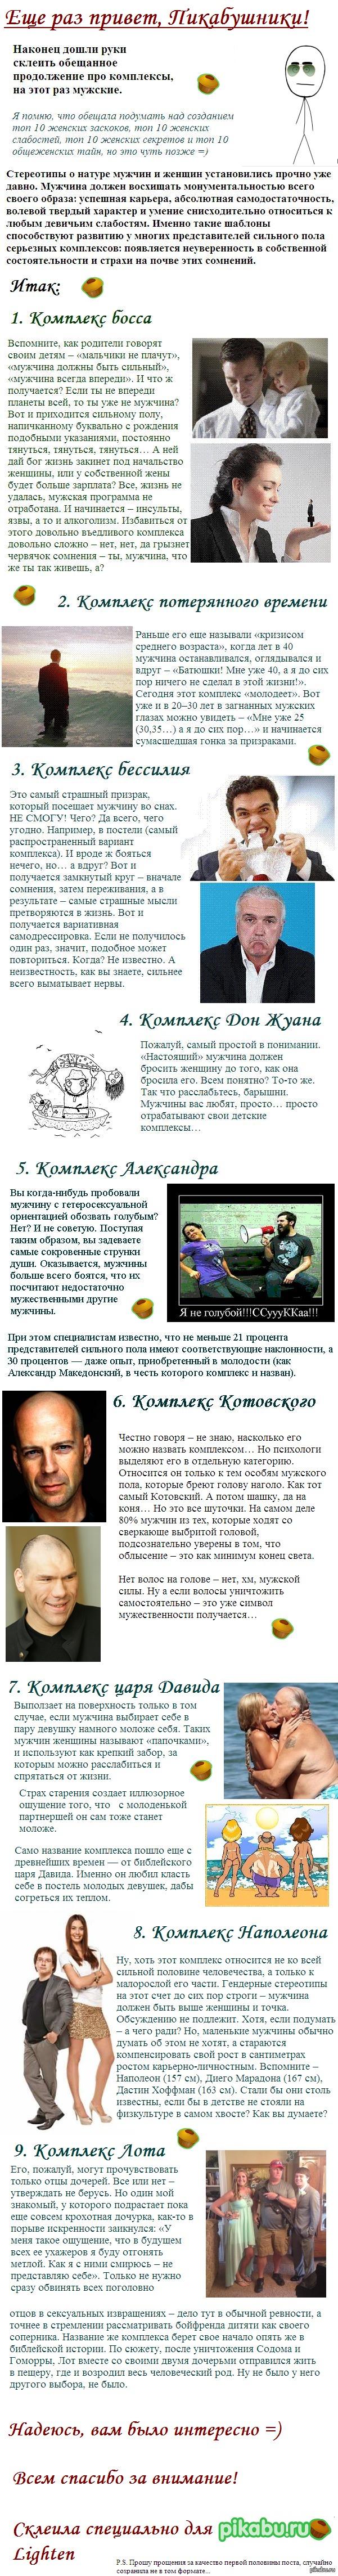 Мужские комплексы Распространенные мужские комплексы.  Пост про женские: pikabu.ru/story/zhenskie_kompleksyi_1398464